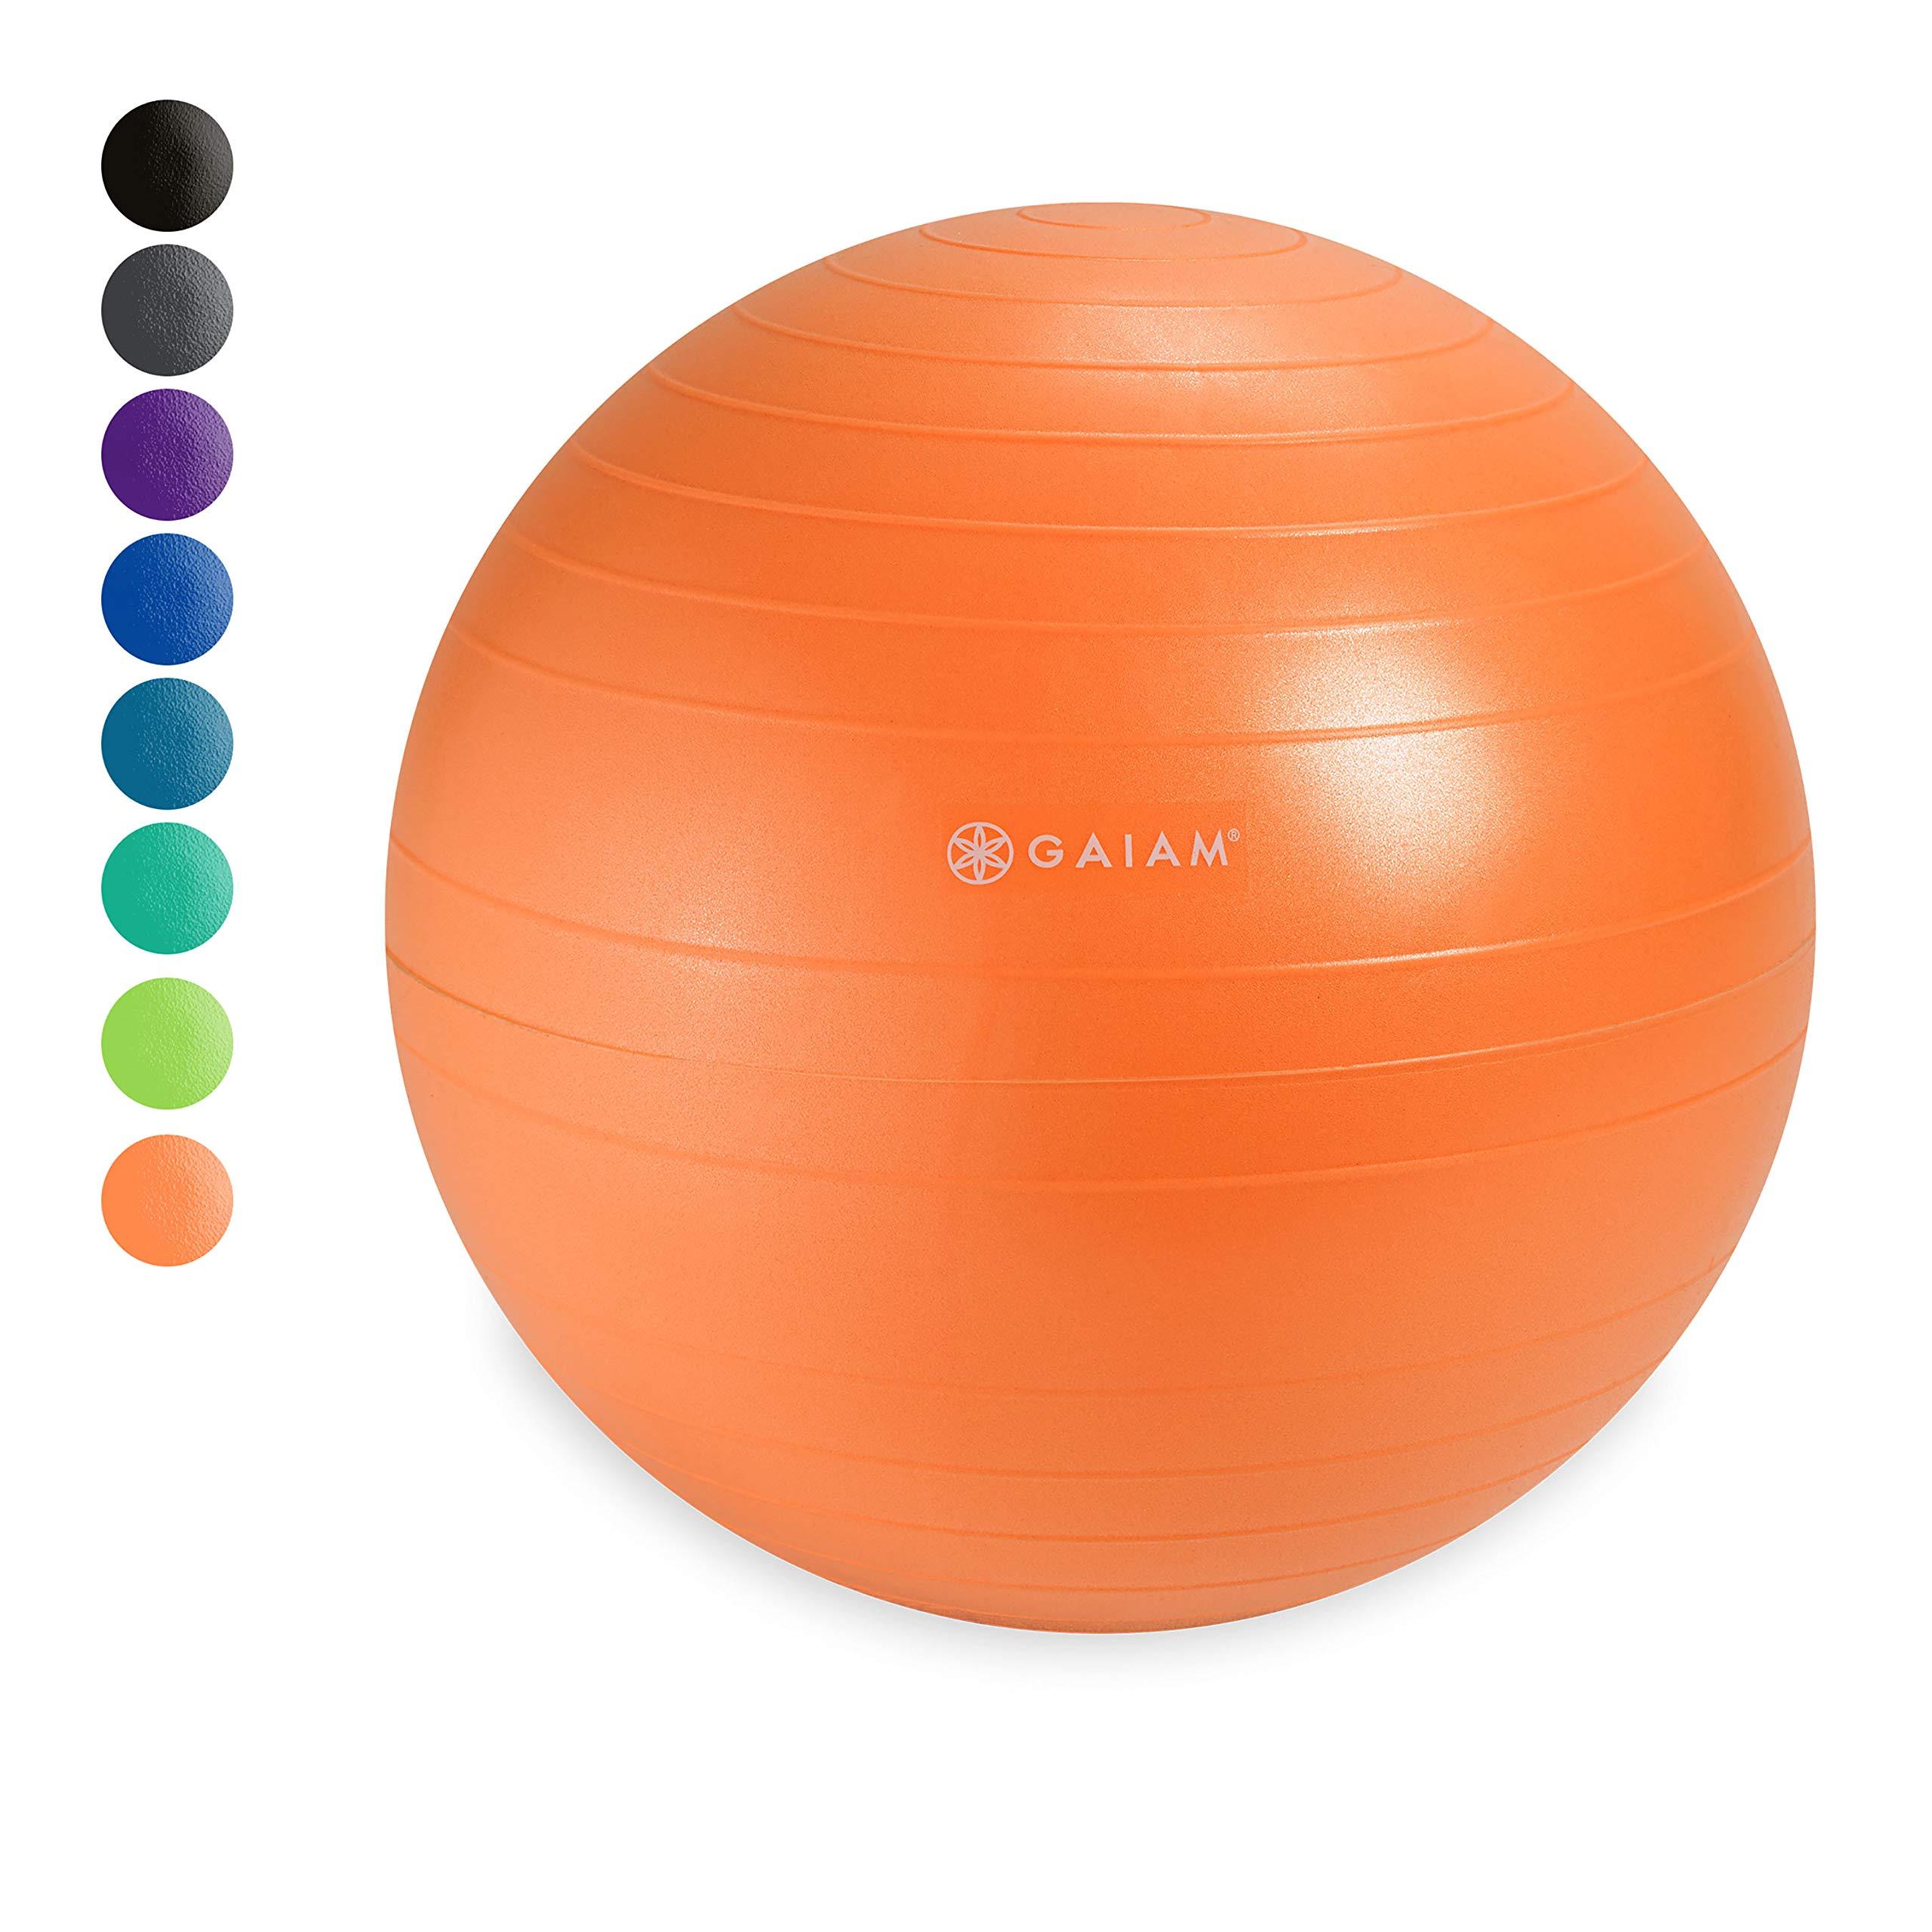 Gaiam Classic Balance Ball Chair Ball - Extra 52cm Balance Ball for Classic Balance Ball Chairs, Nectarine